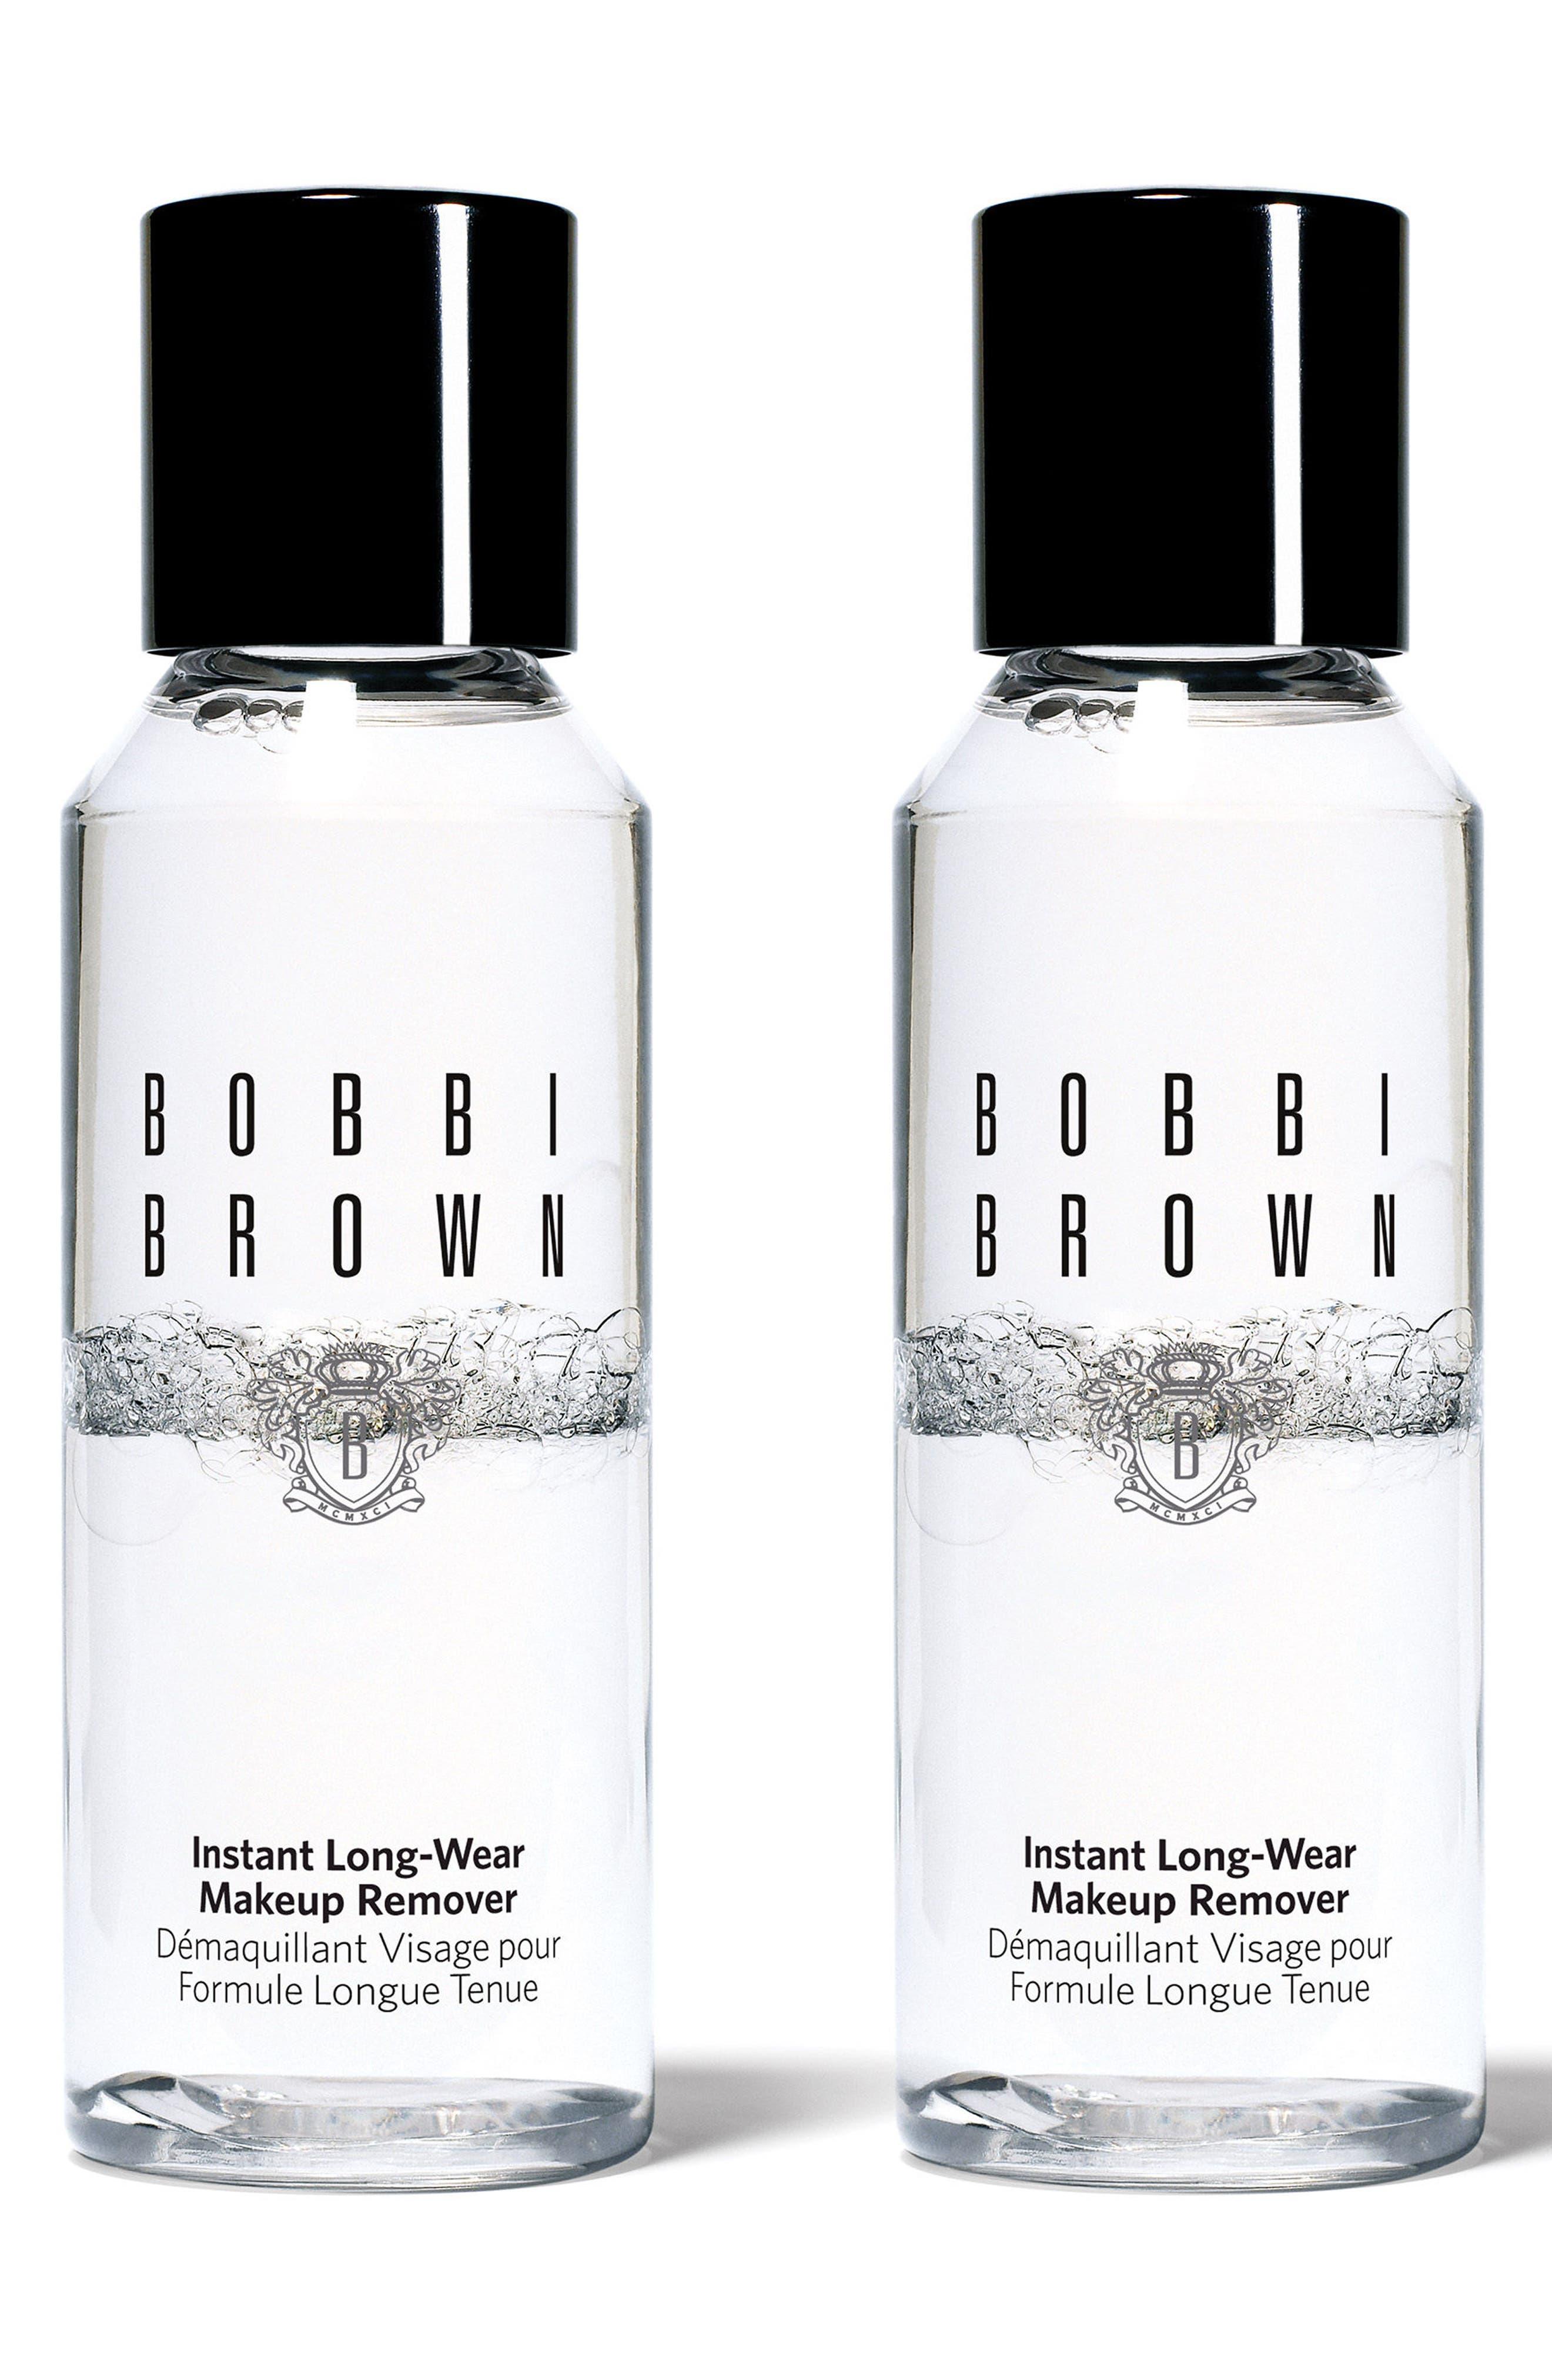 Bobbi Brown Instant Long-Wear Makeup Remover Duo (Nordstrom Exclusive) ($56 Value)